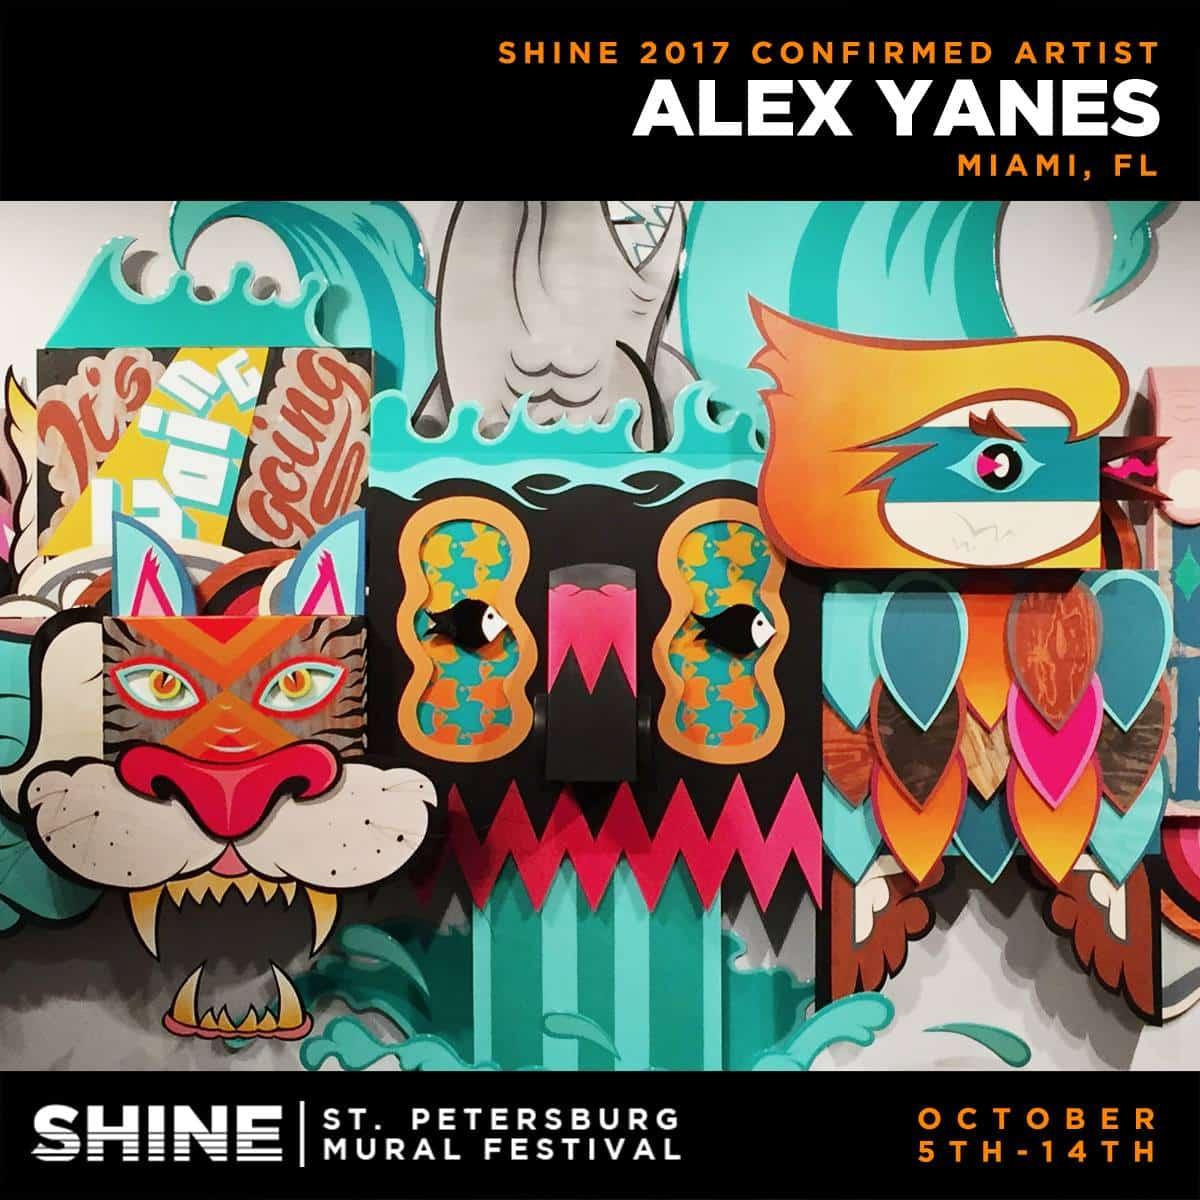 SHINE artist - alex yanes